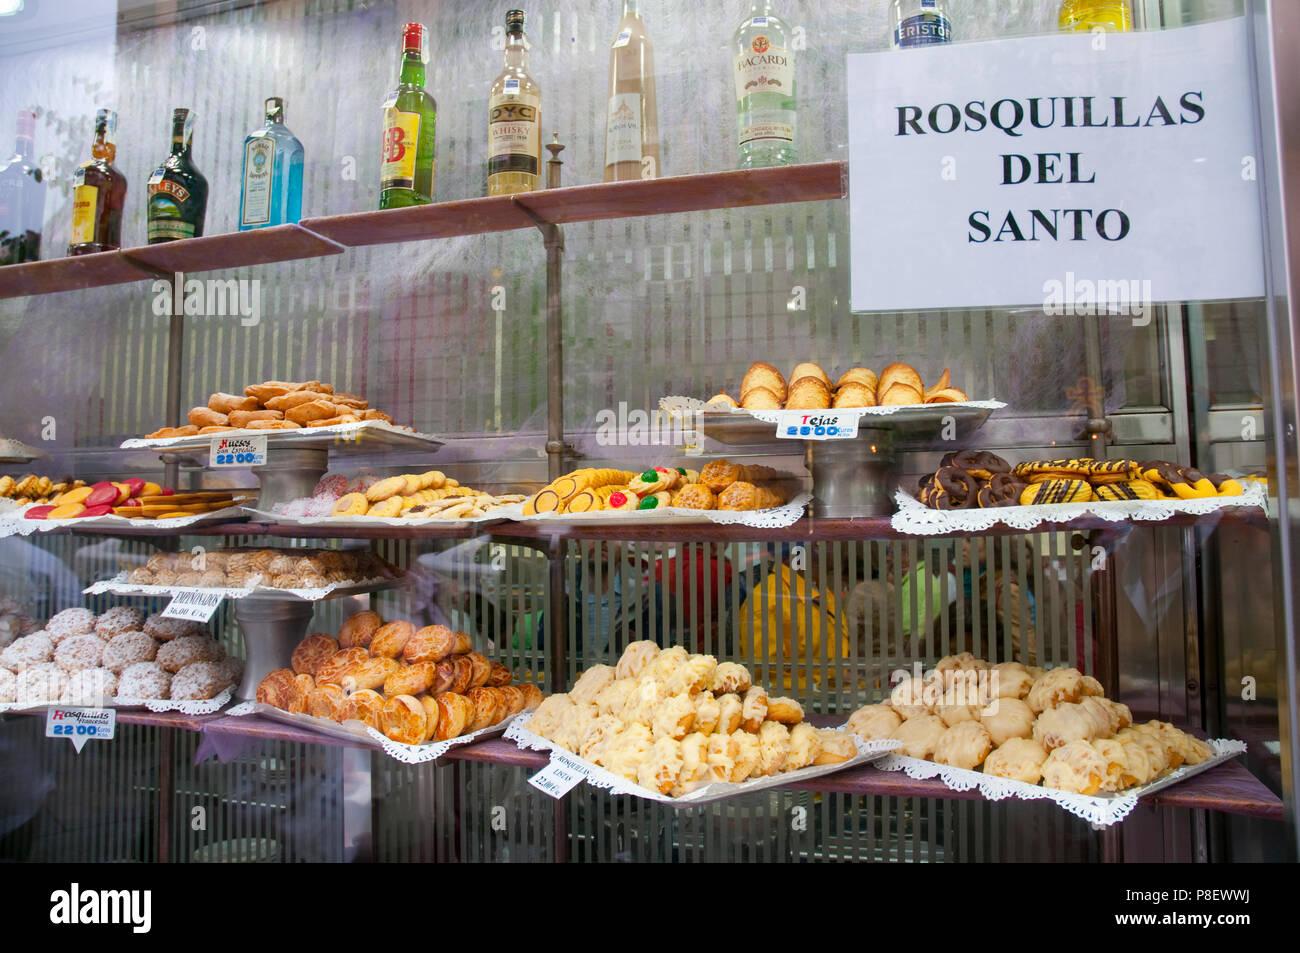 Shop window of La Mallorquina patisserie. Madrid, Spain. - Stock Image